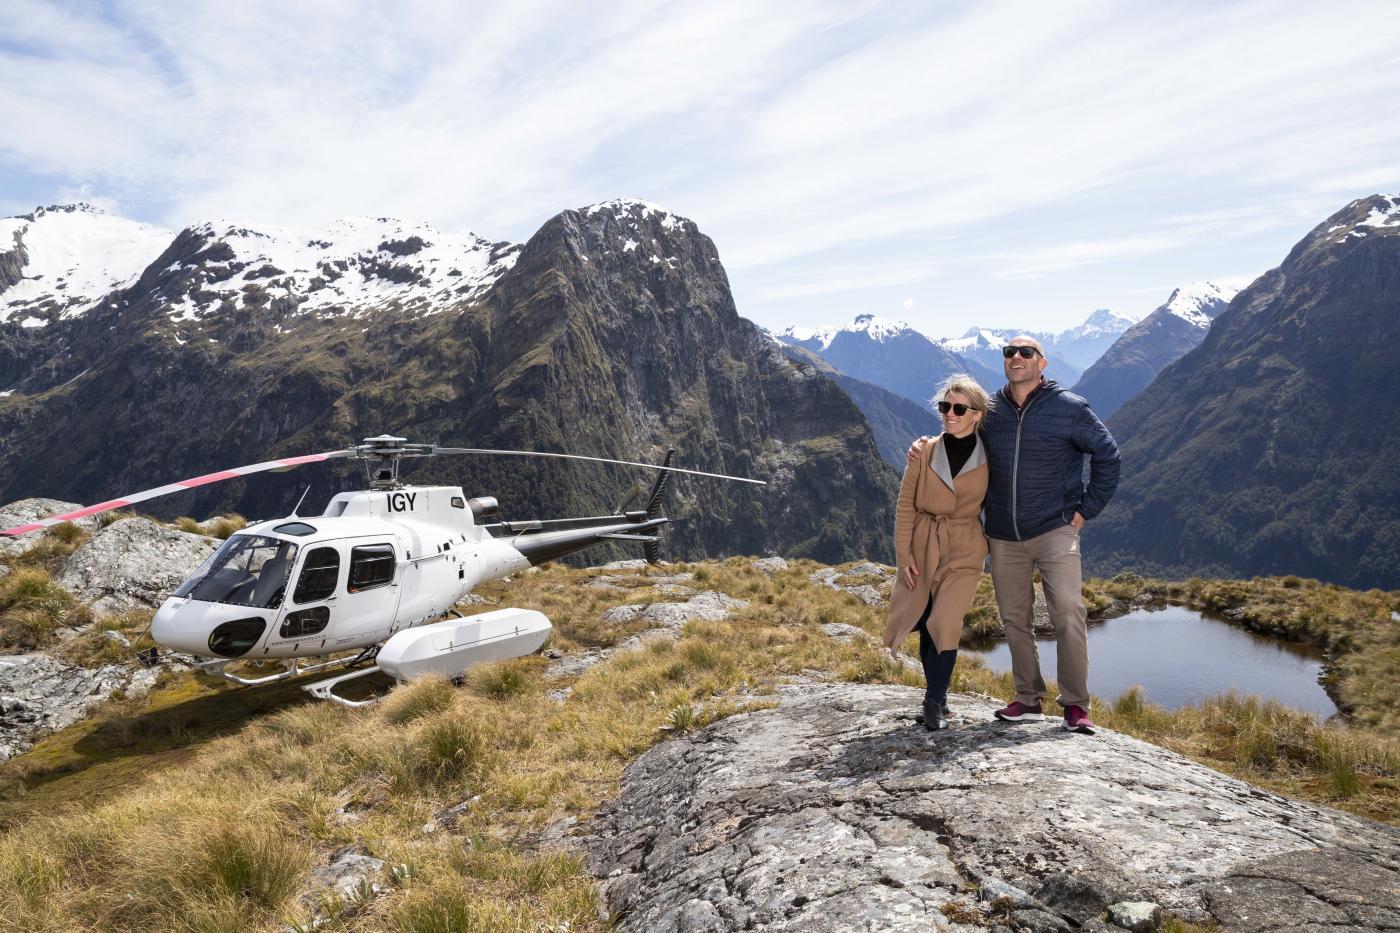 Heli Glenorchy Private Alpine Landing